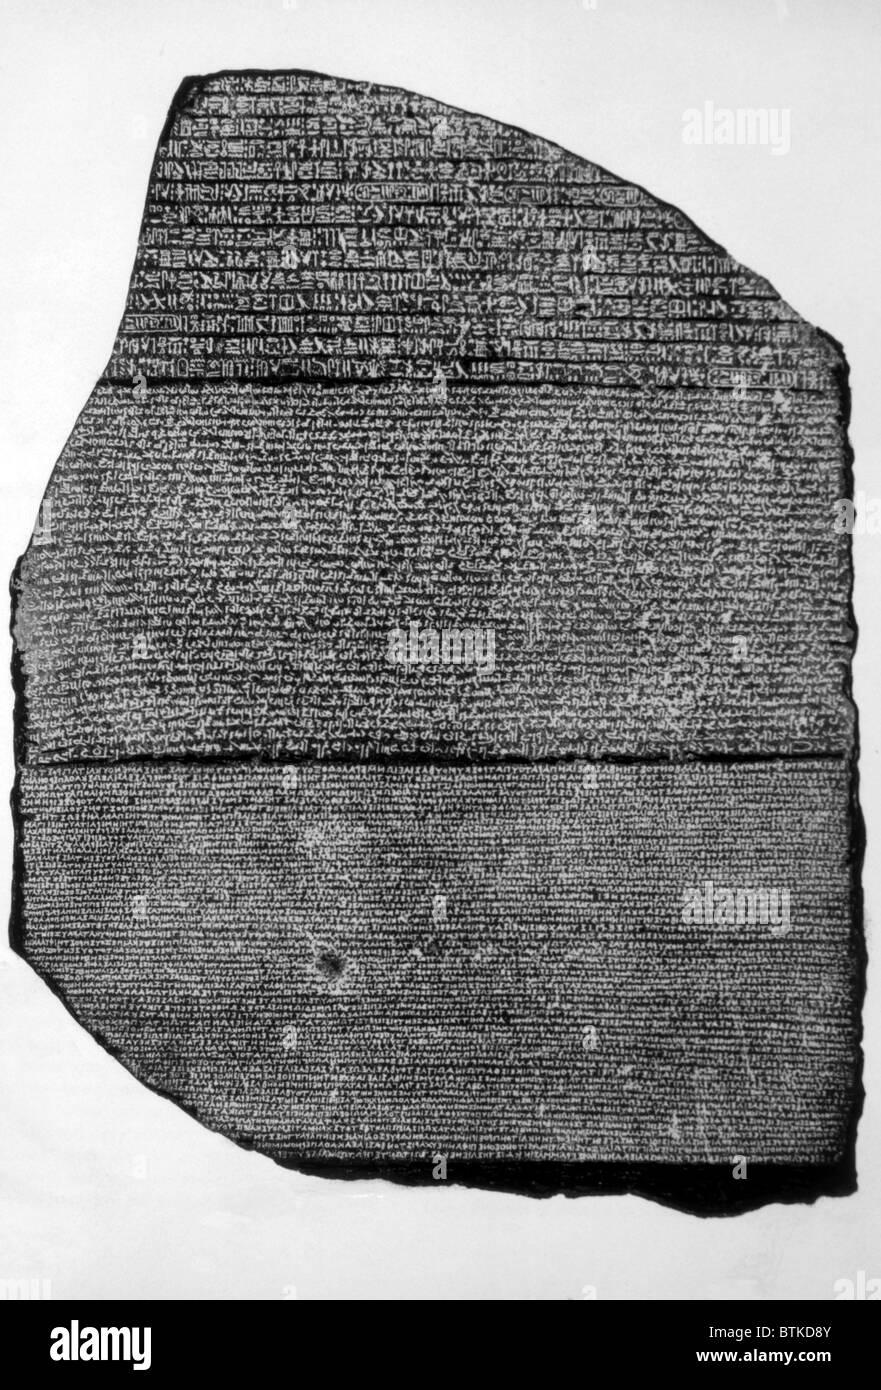 Rosetta Stone Stock Photos Amp Rosetta Stone Stock Images